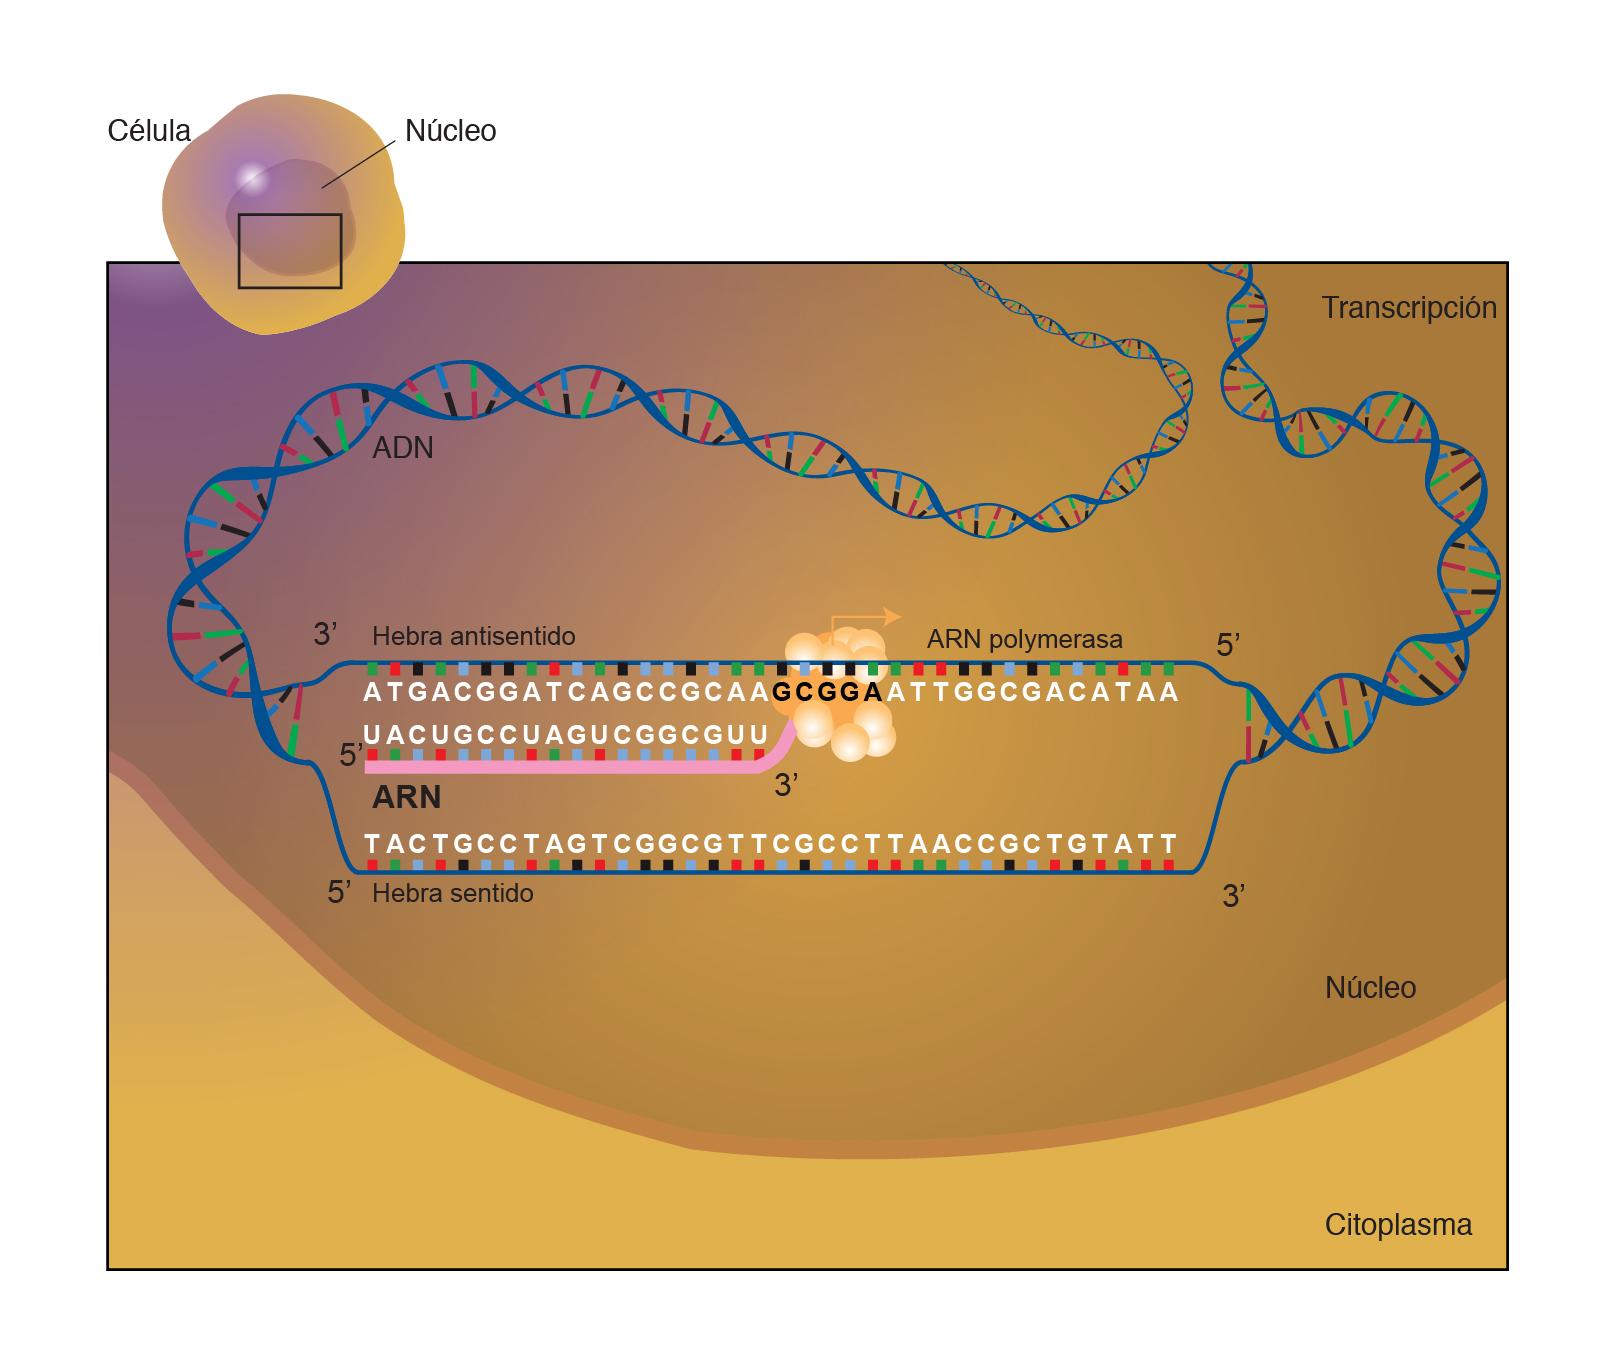 Arn ácido Ribonucleico Nhgri